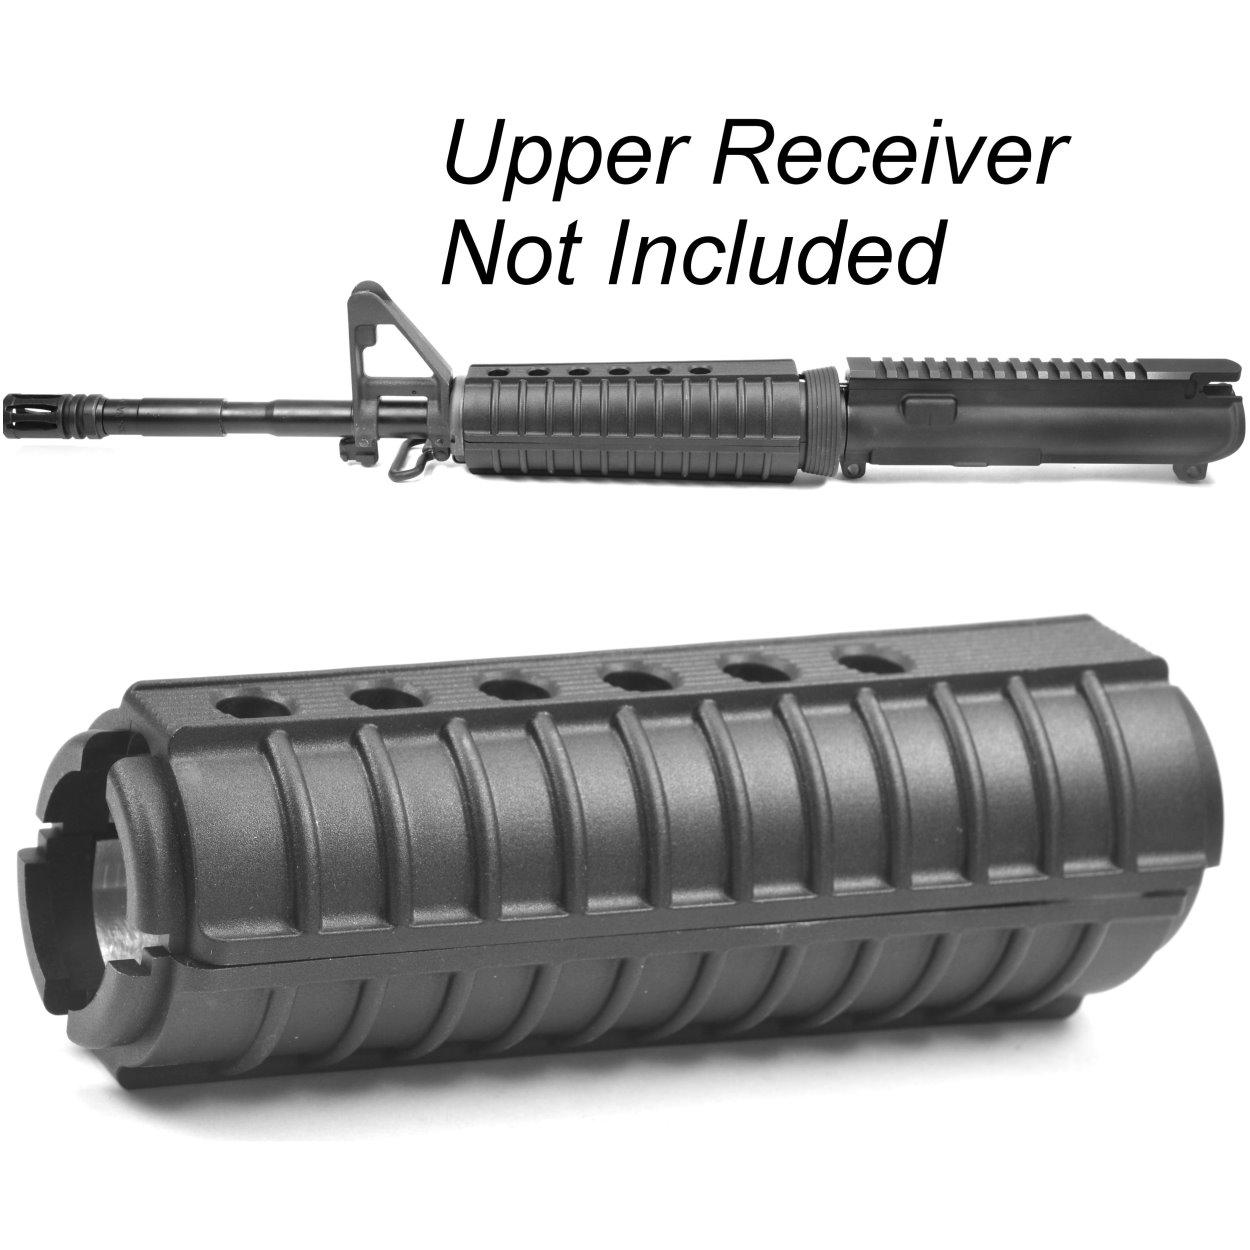 DSA AR15 C A R  Handguard Set - Tapered With Heat Shields DSA AR15 C A R   Handguard Set - Tapered With Heat Shields